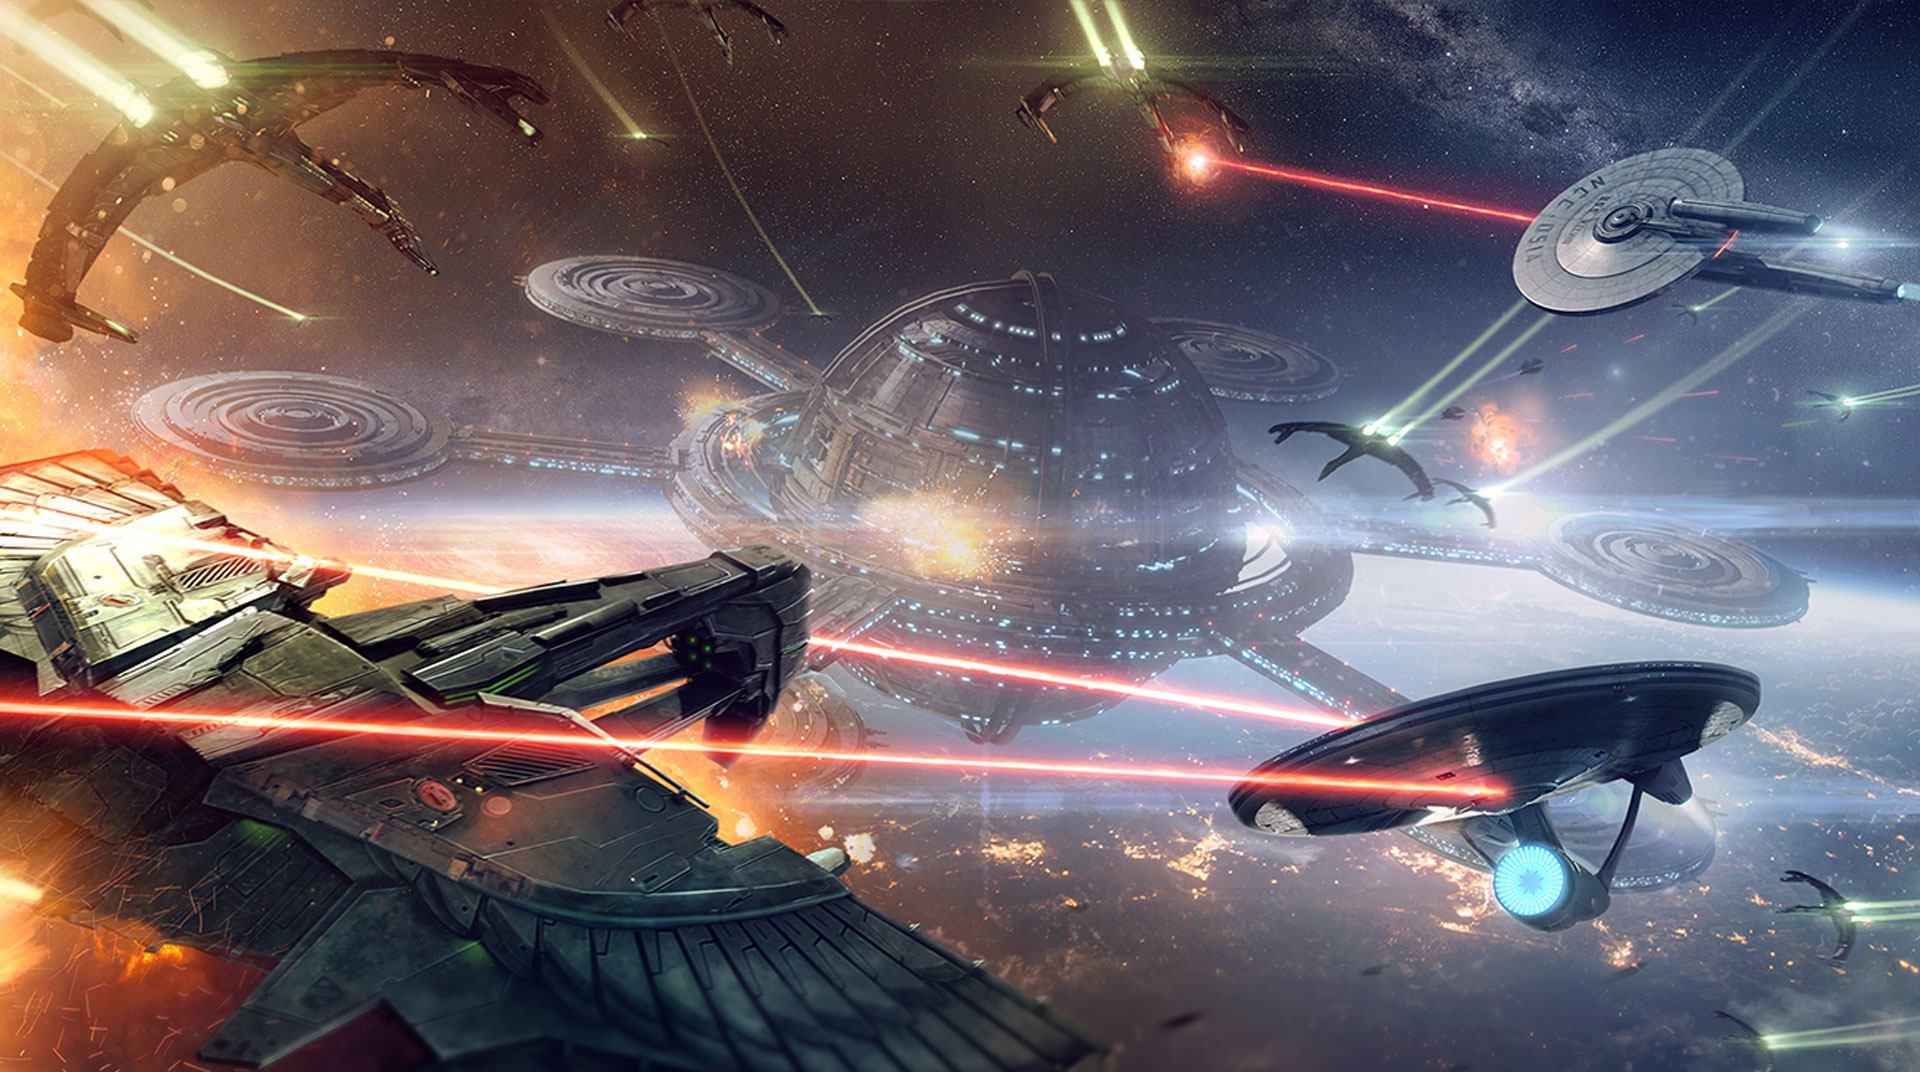 Star Trek Fleet Commandtelecharger gratuit sans verification humaine